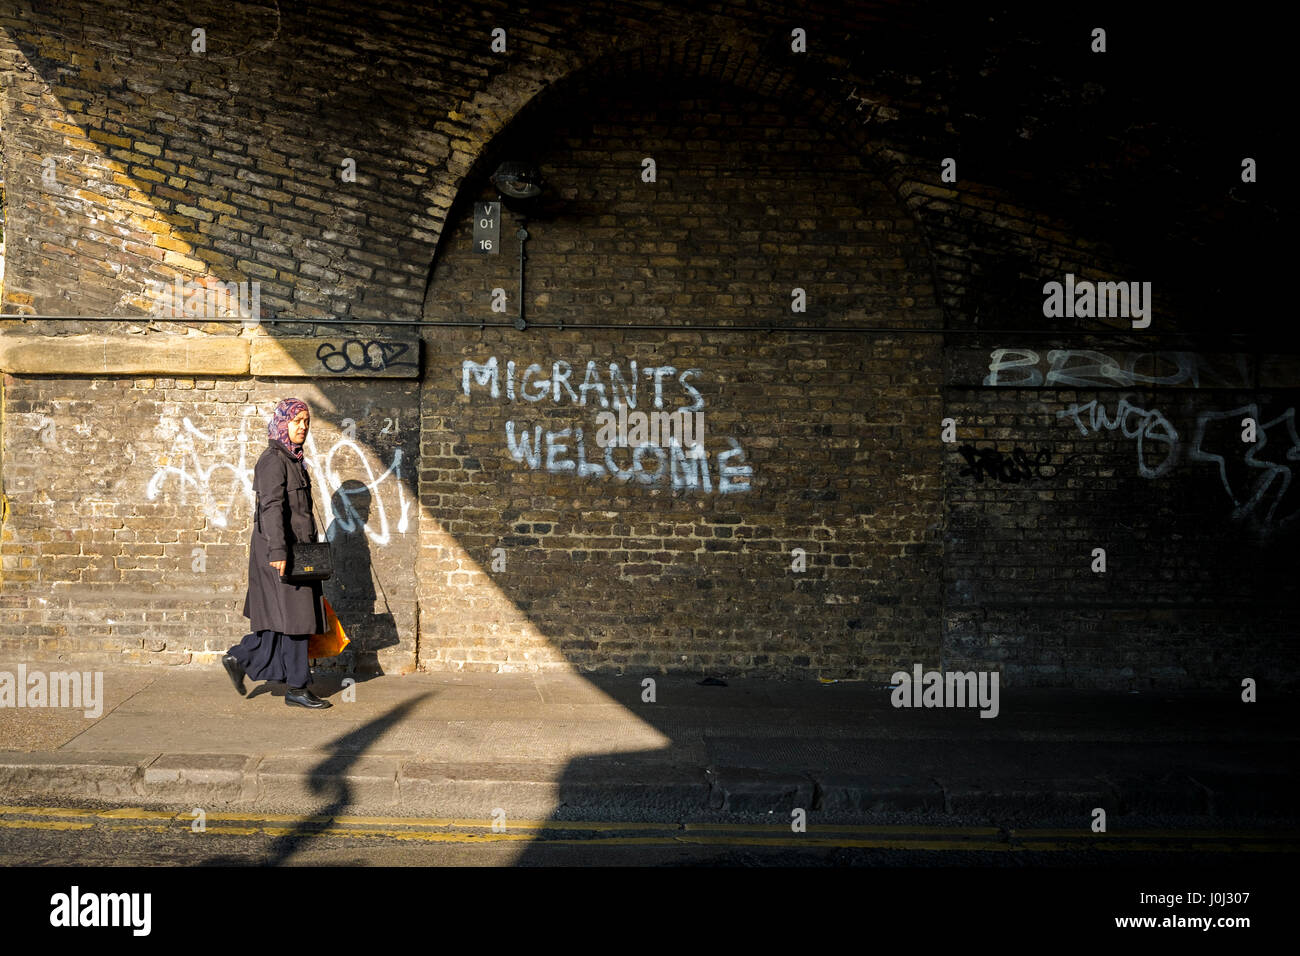 Asian woman walks past graffiti in London's Bethnal Green welcoming migrants. Stock Photo